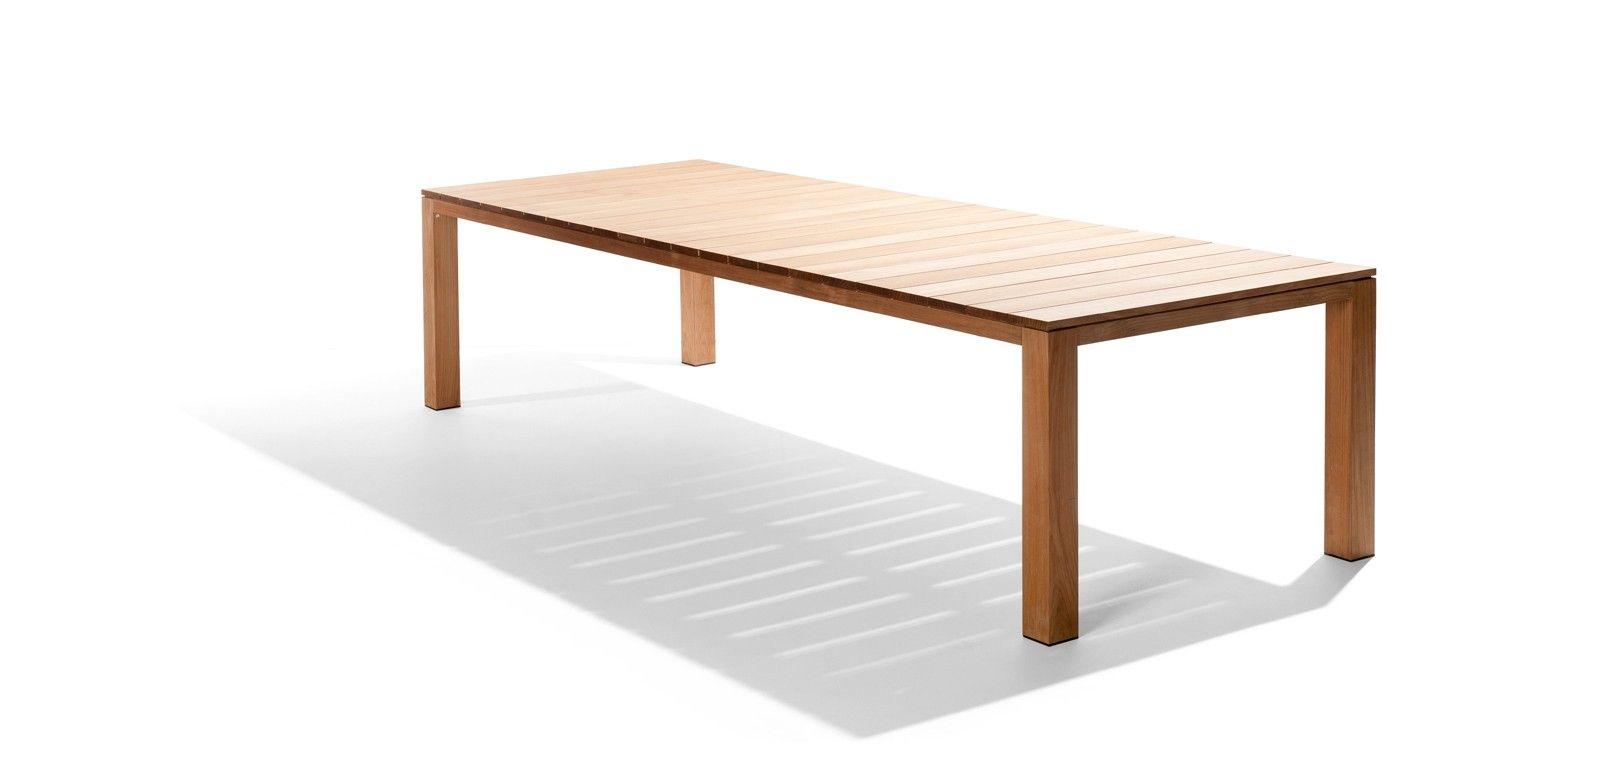 Kos outdoor table tribù